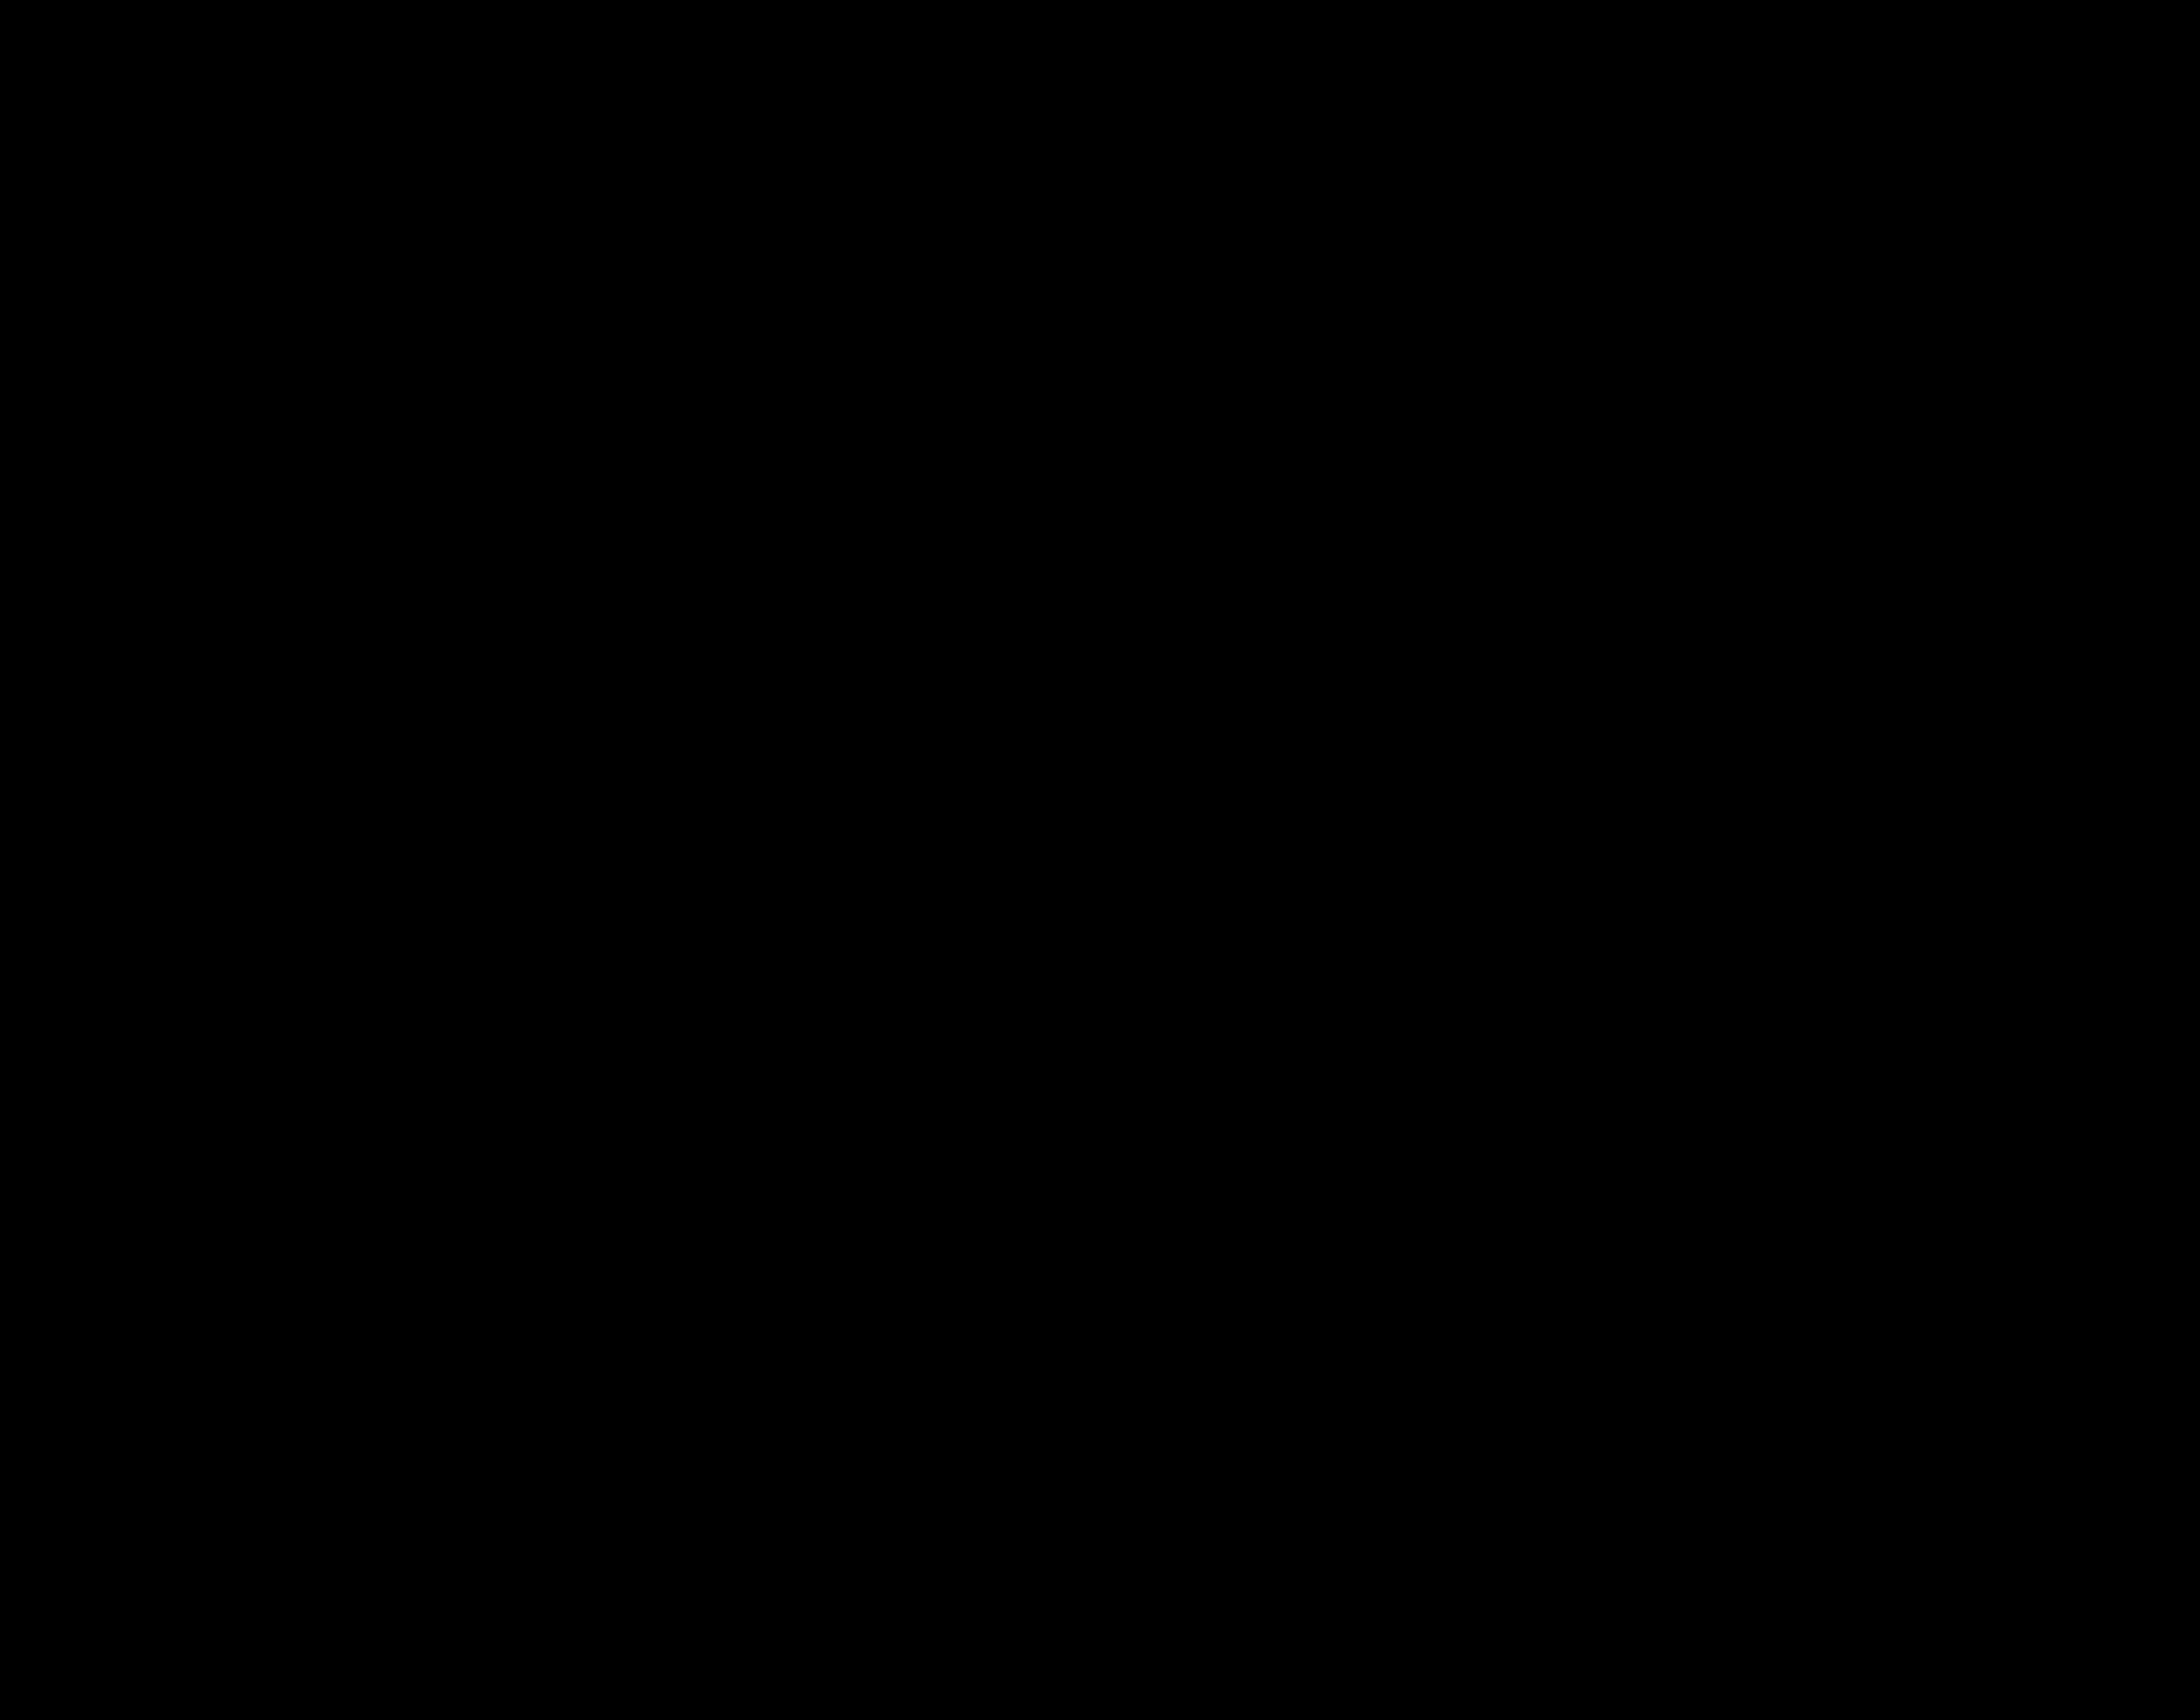 MAL-dPEG®₂₄-Tris(-dPEG®₂₄-Tris(m-dPEG®₂₄)₃)₃